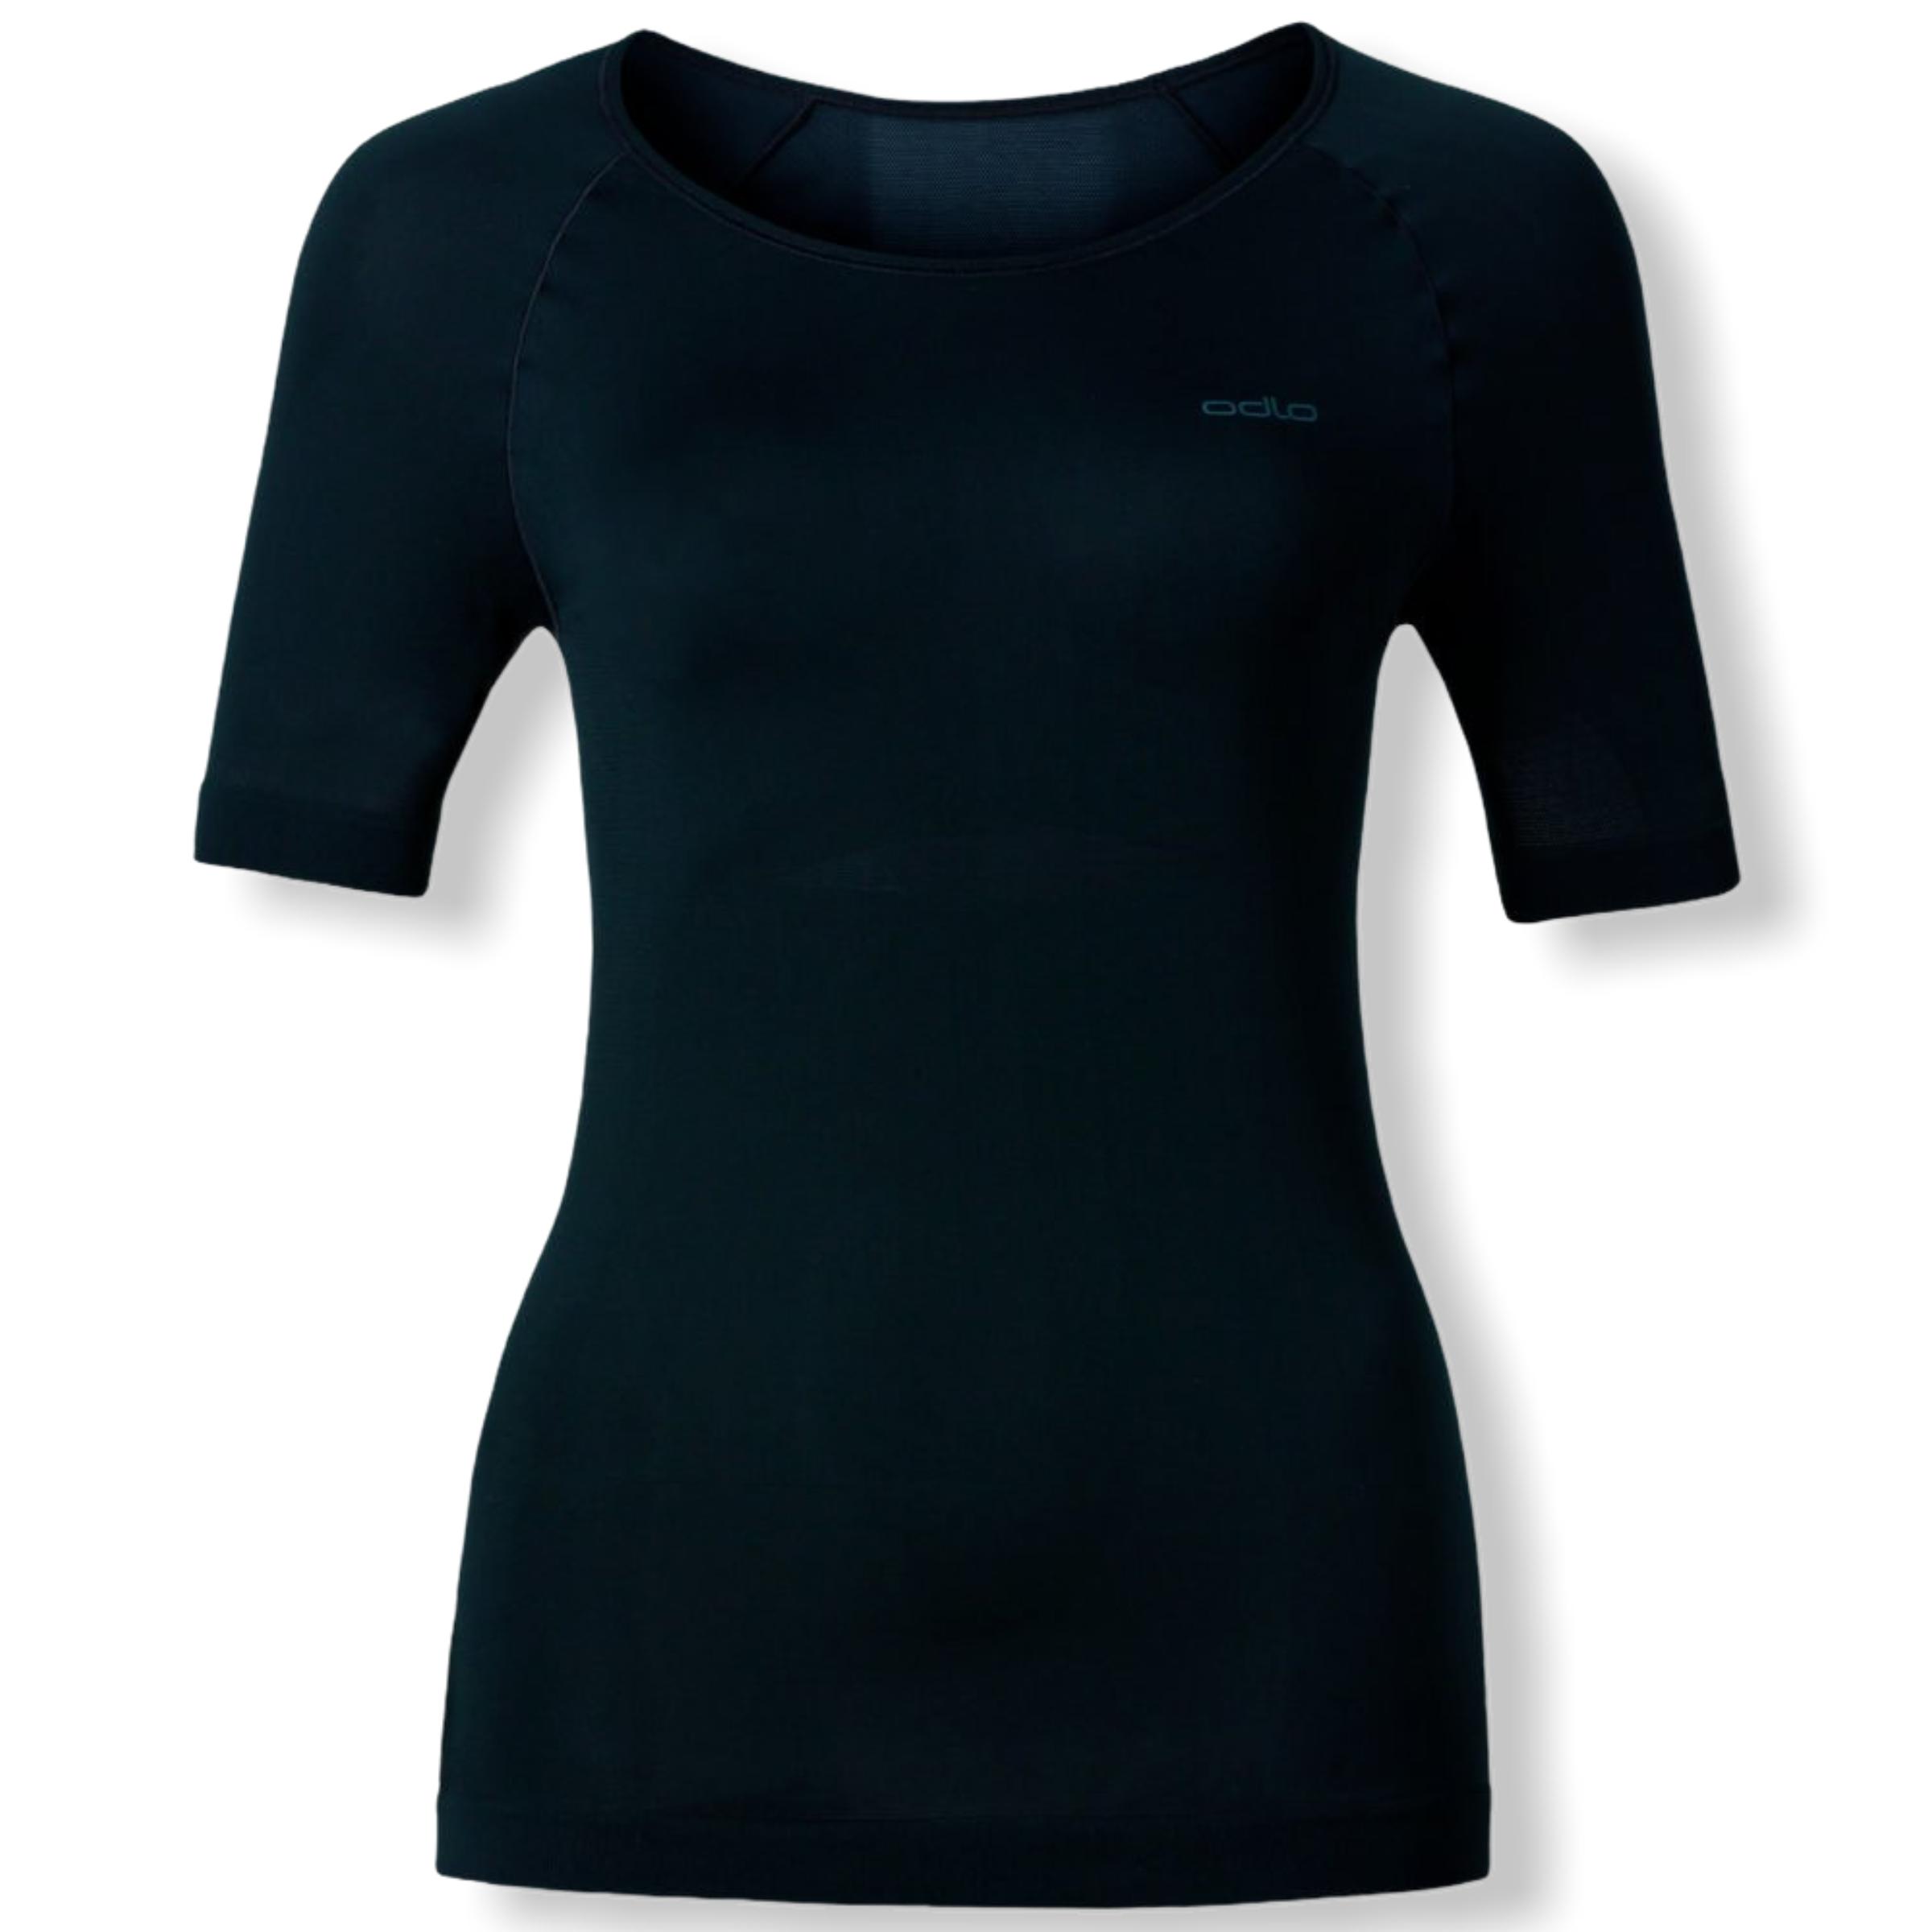 Odlo - T-shirt EVOLUTION X-LIGHT